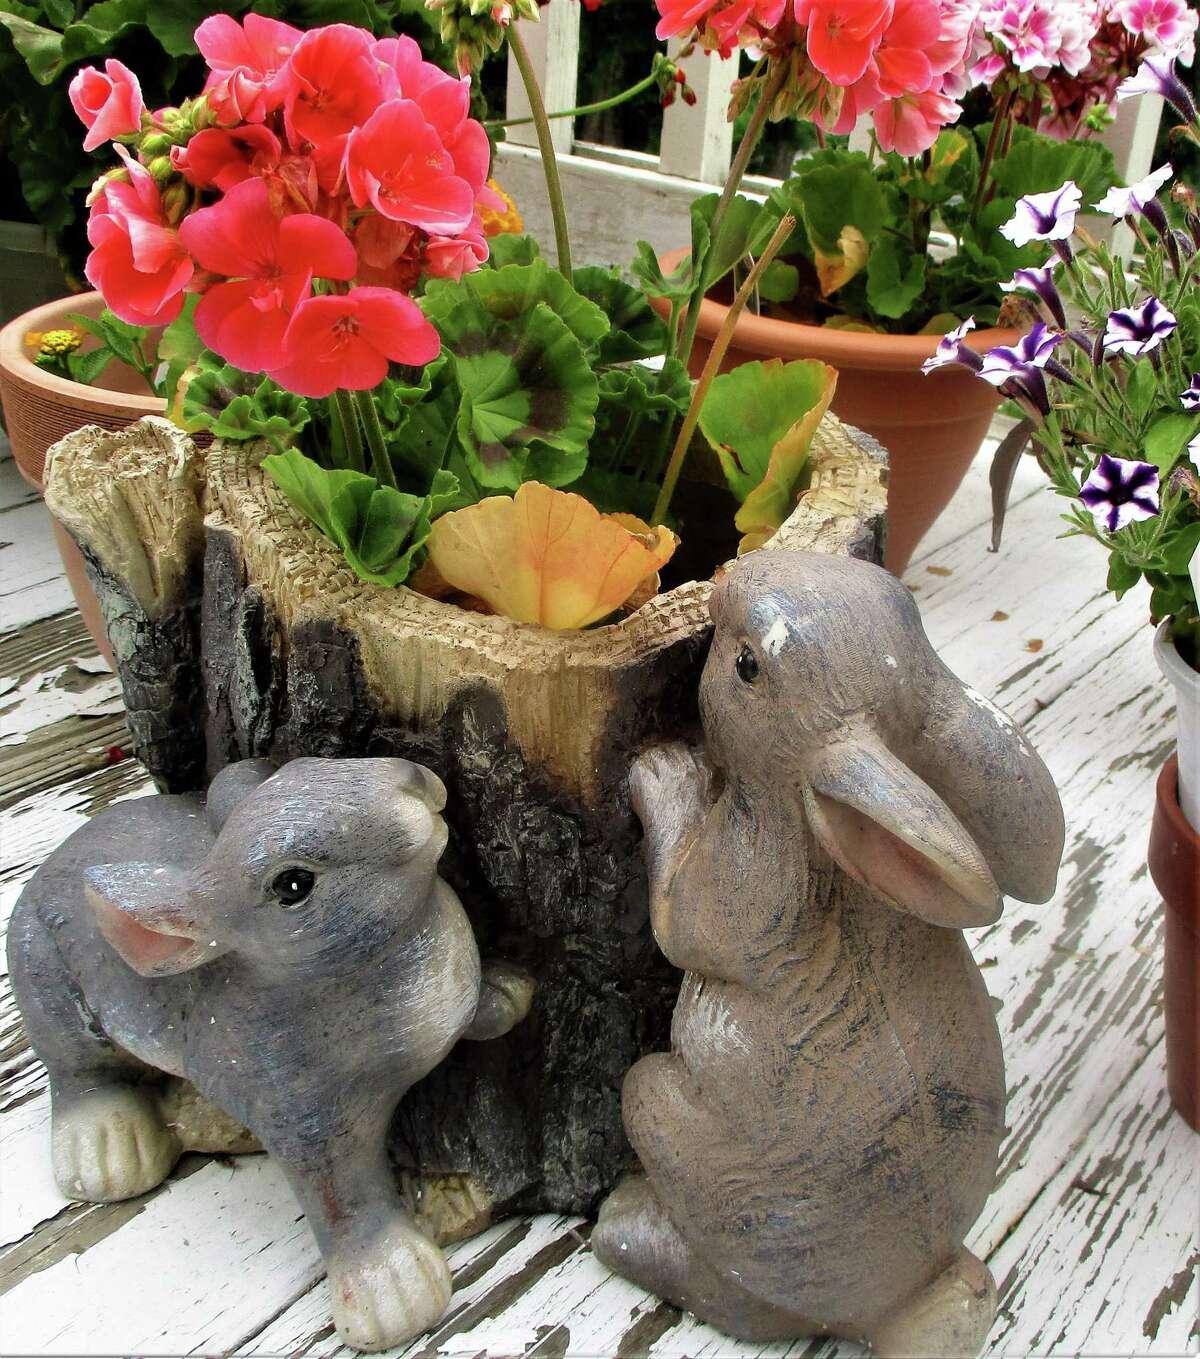 Bunnies and tree stump plantar